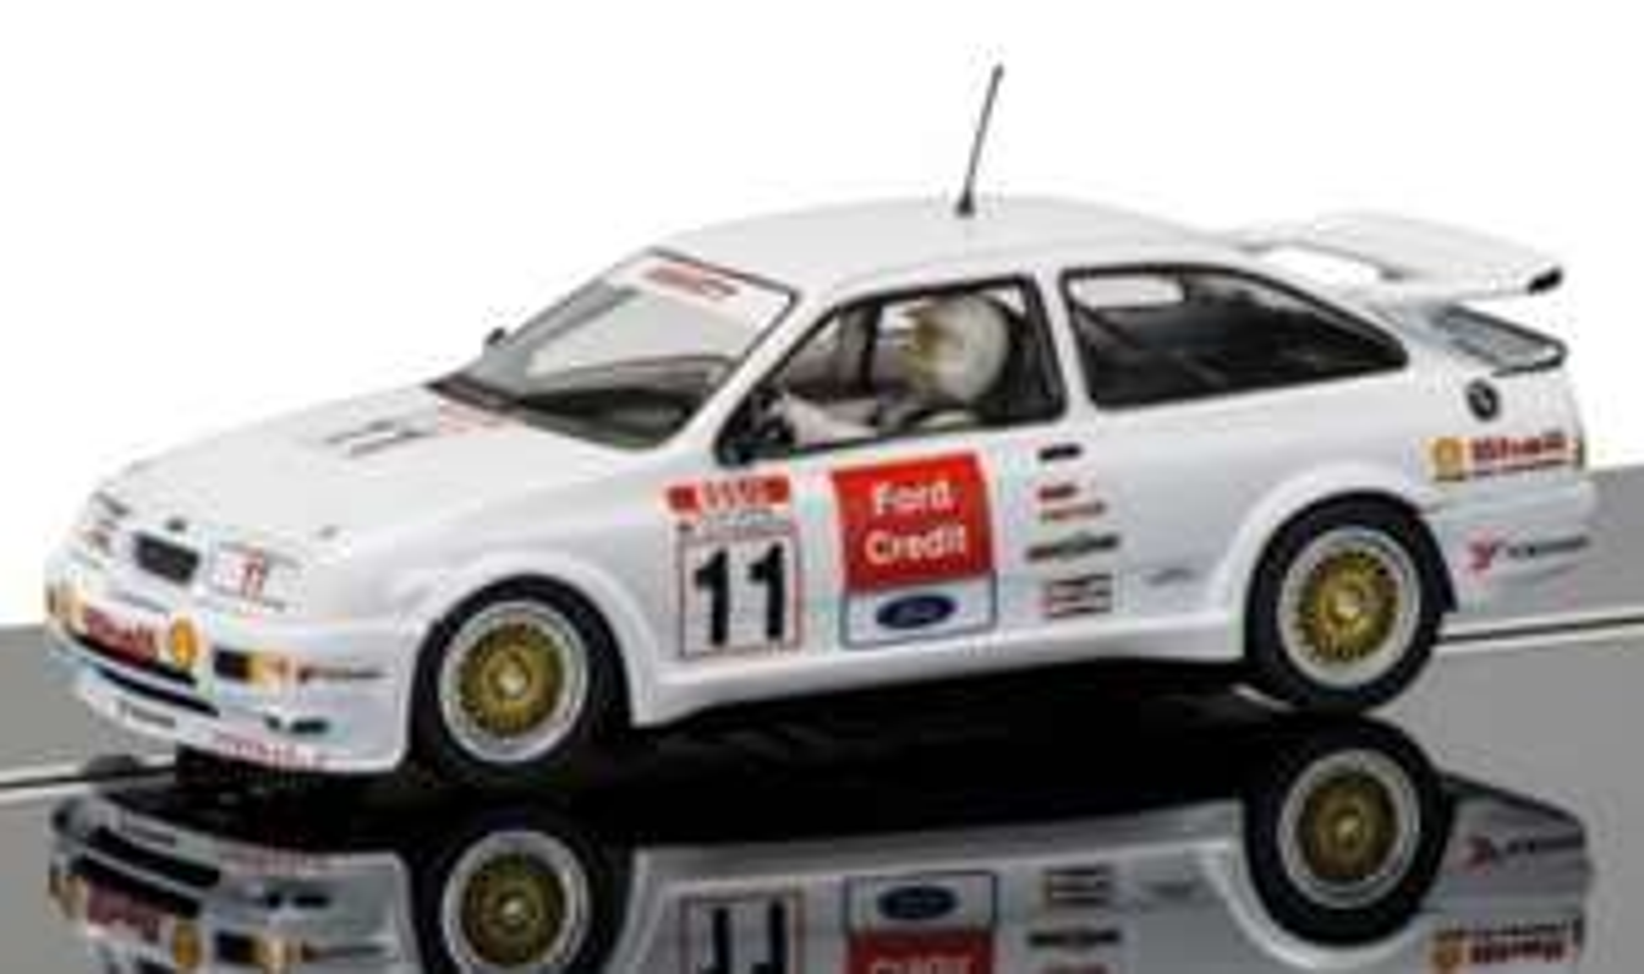 Scalextric C3781 Robb Gravatt BTCC Ford Sierra RS500-Robb Gravett, Brands Hatch 1990 Car £20 (Prime Exclusive) @ Amazon